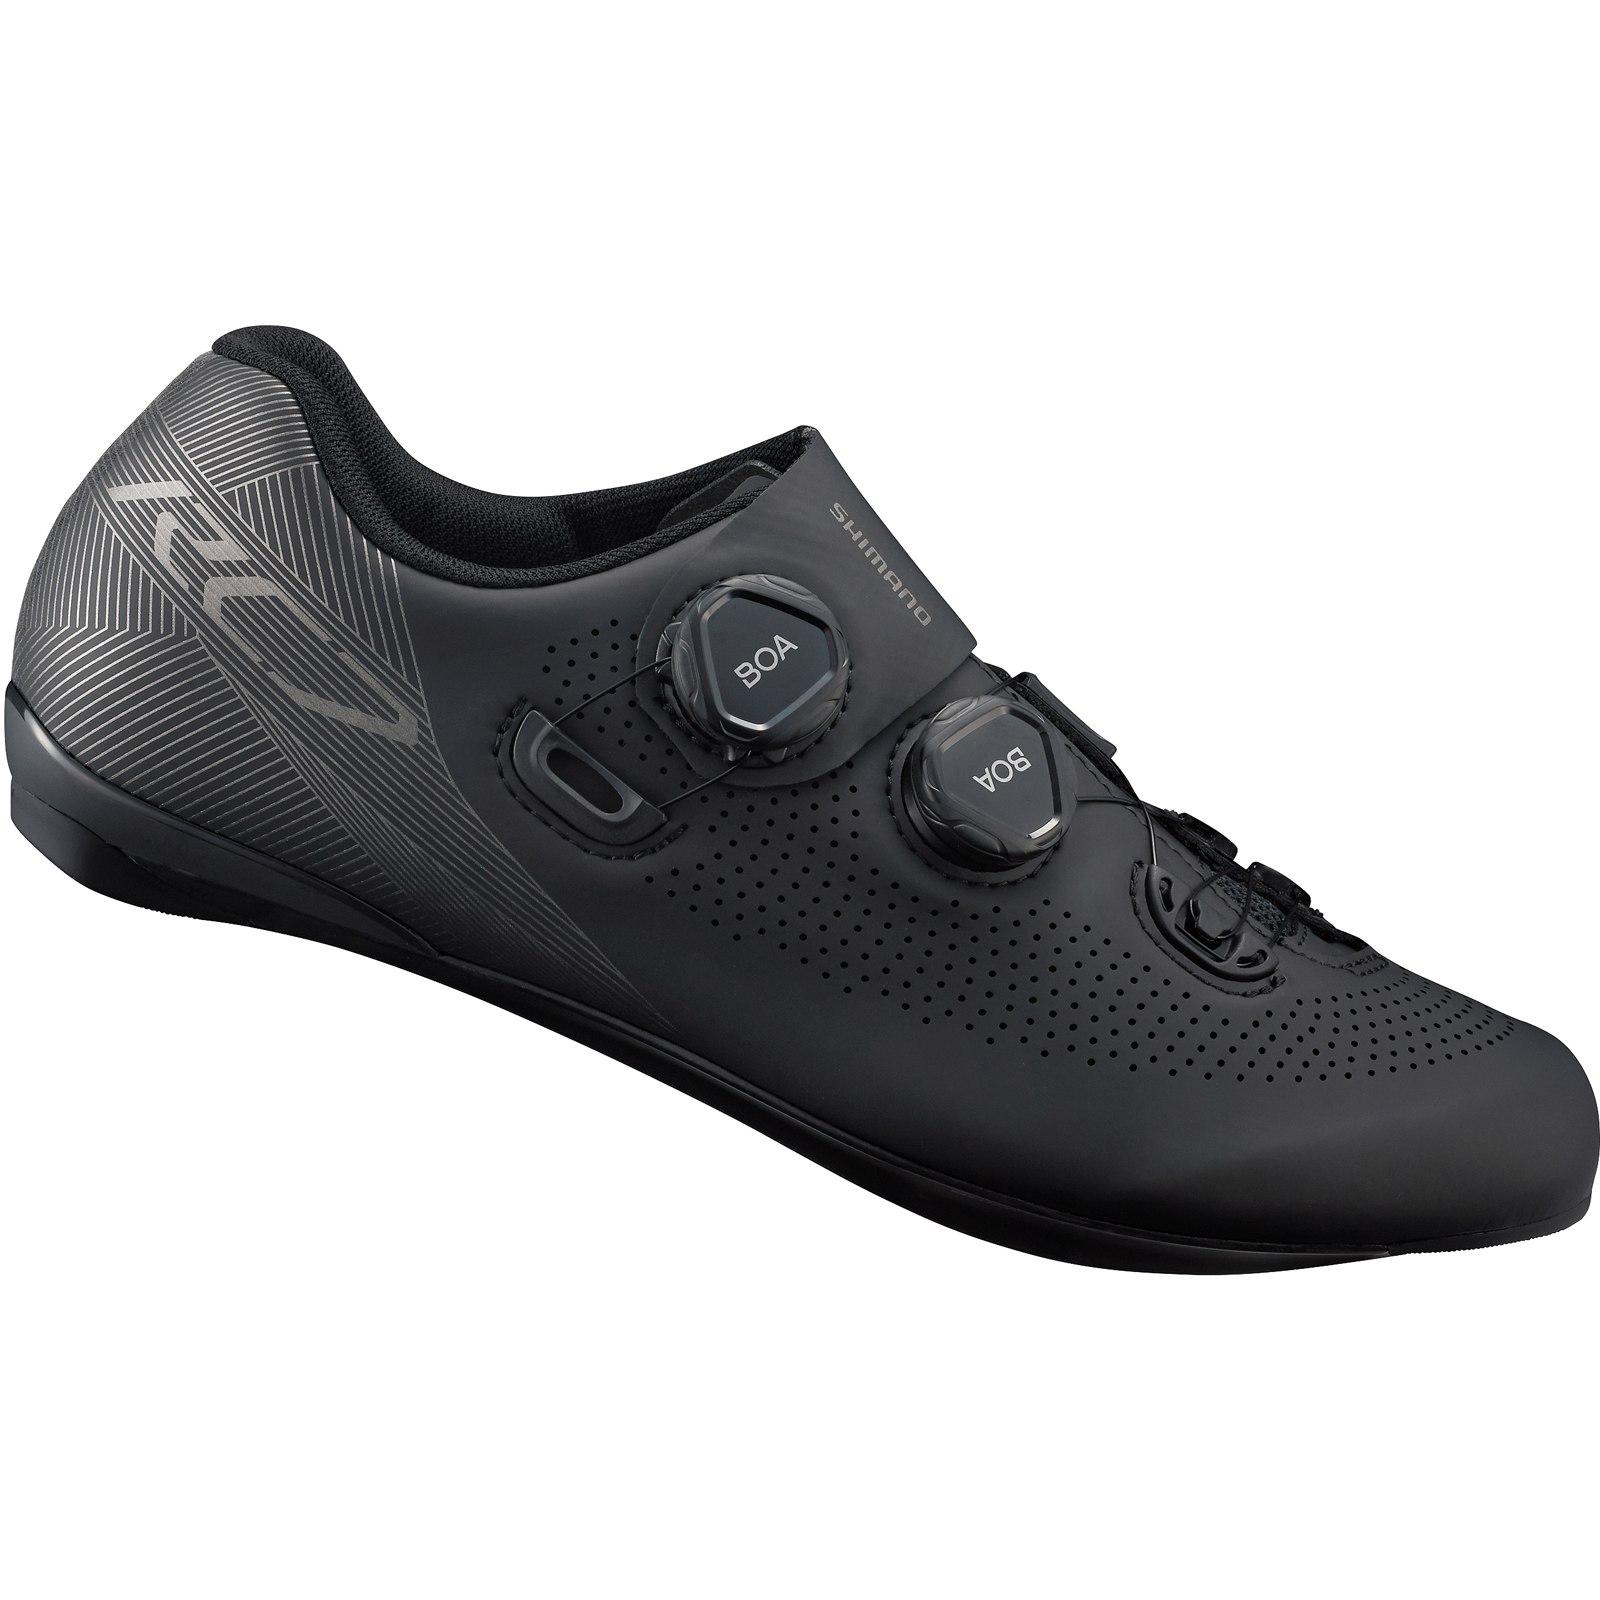 Shimano SH-RC701 Rennradschuh - black